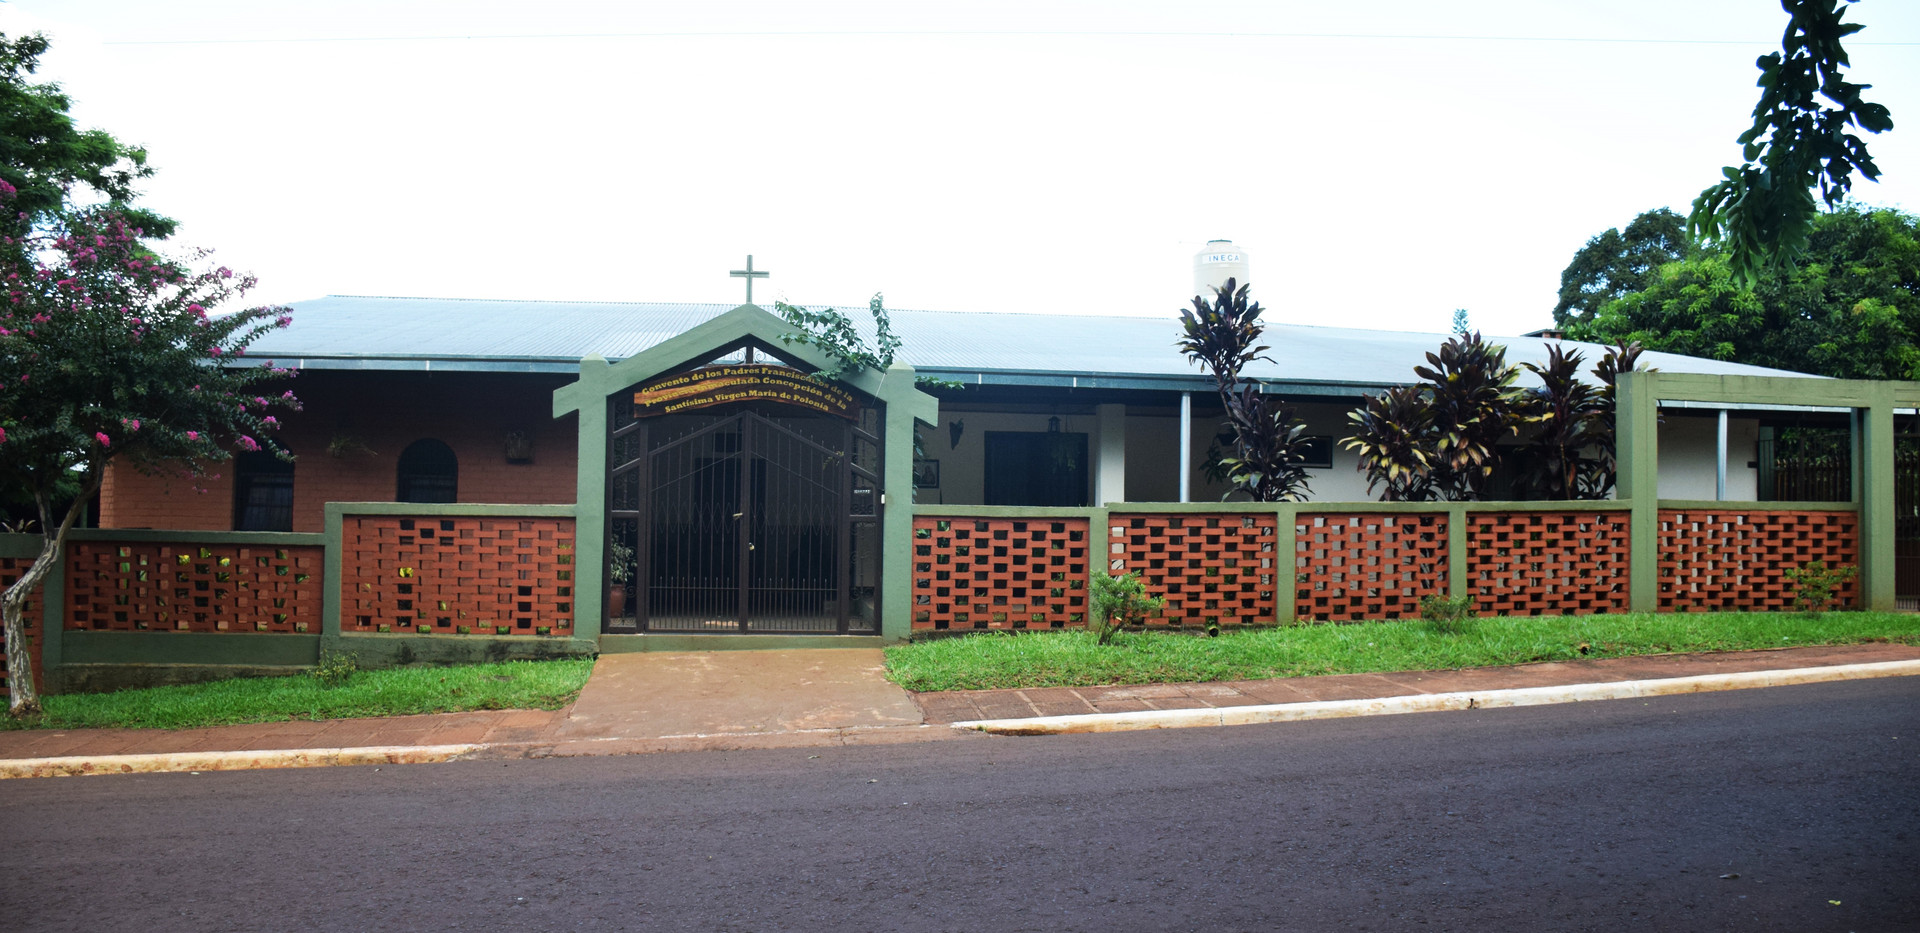 El convento/Widok na całość